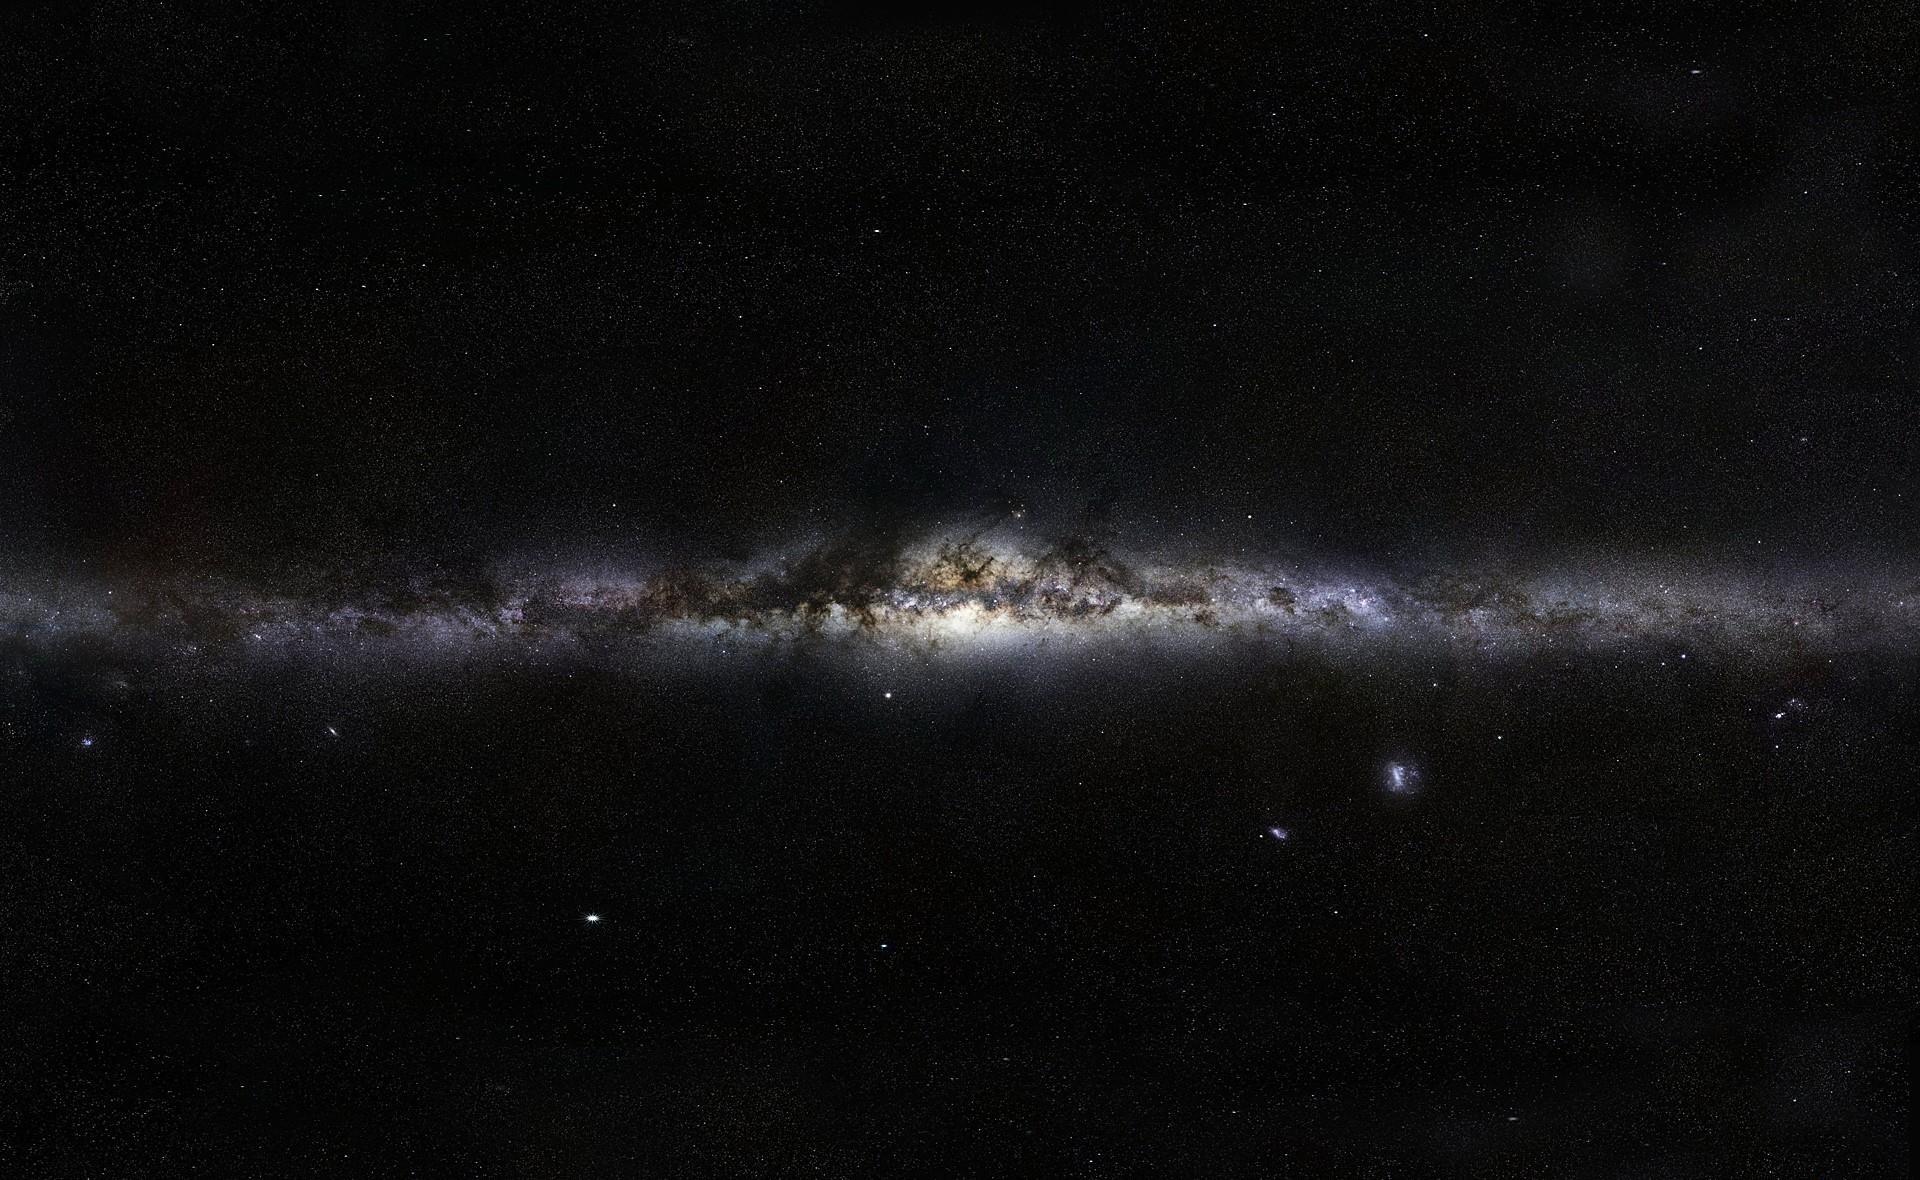 Milky Way Stars Space Wallpaper 1920x1180 340x220